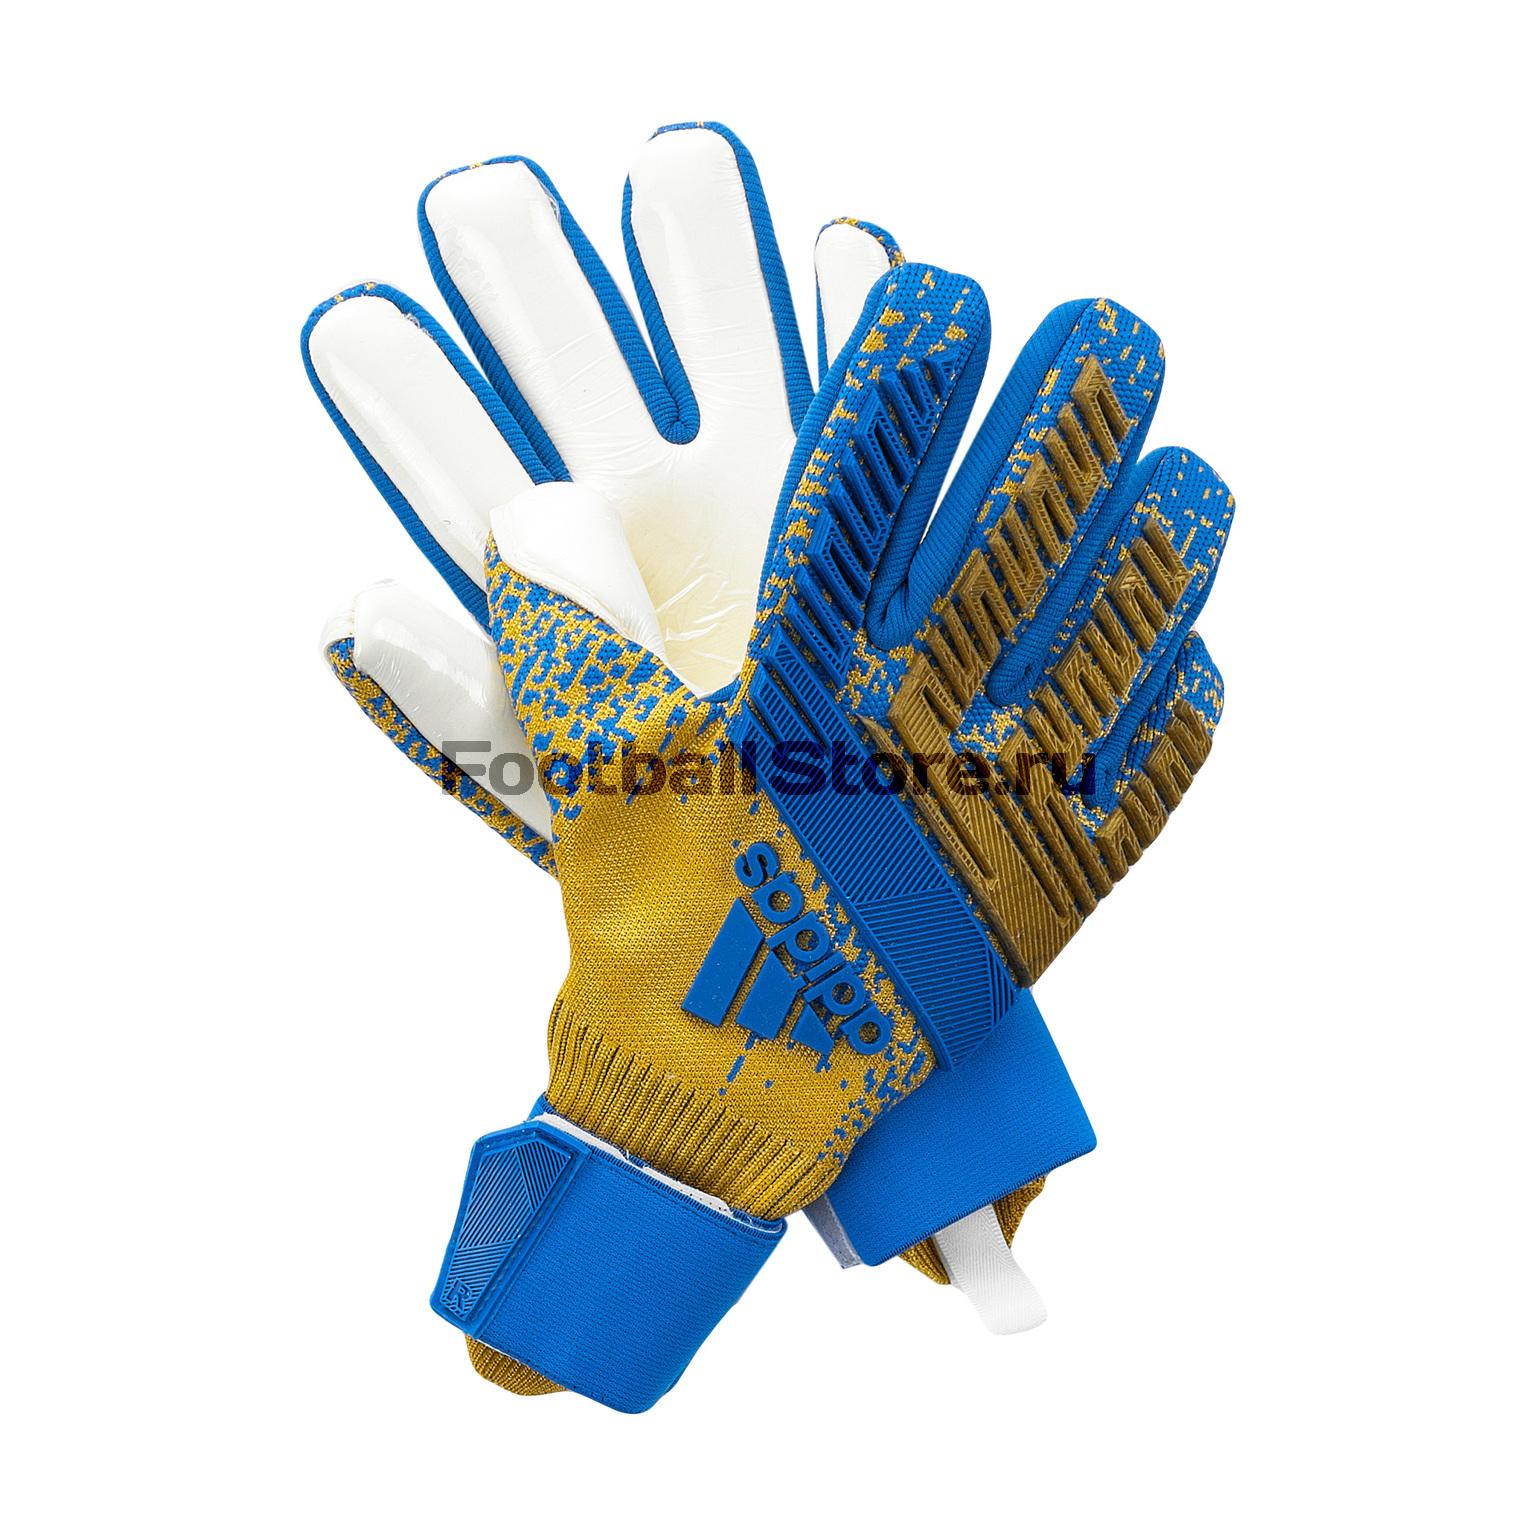 Вратарские перчатки Adidas Predator Pro PC DY2628 цена